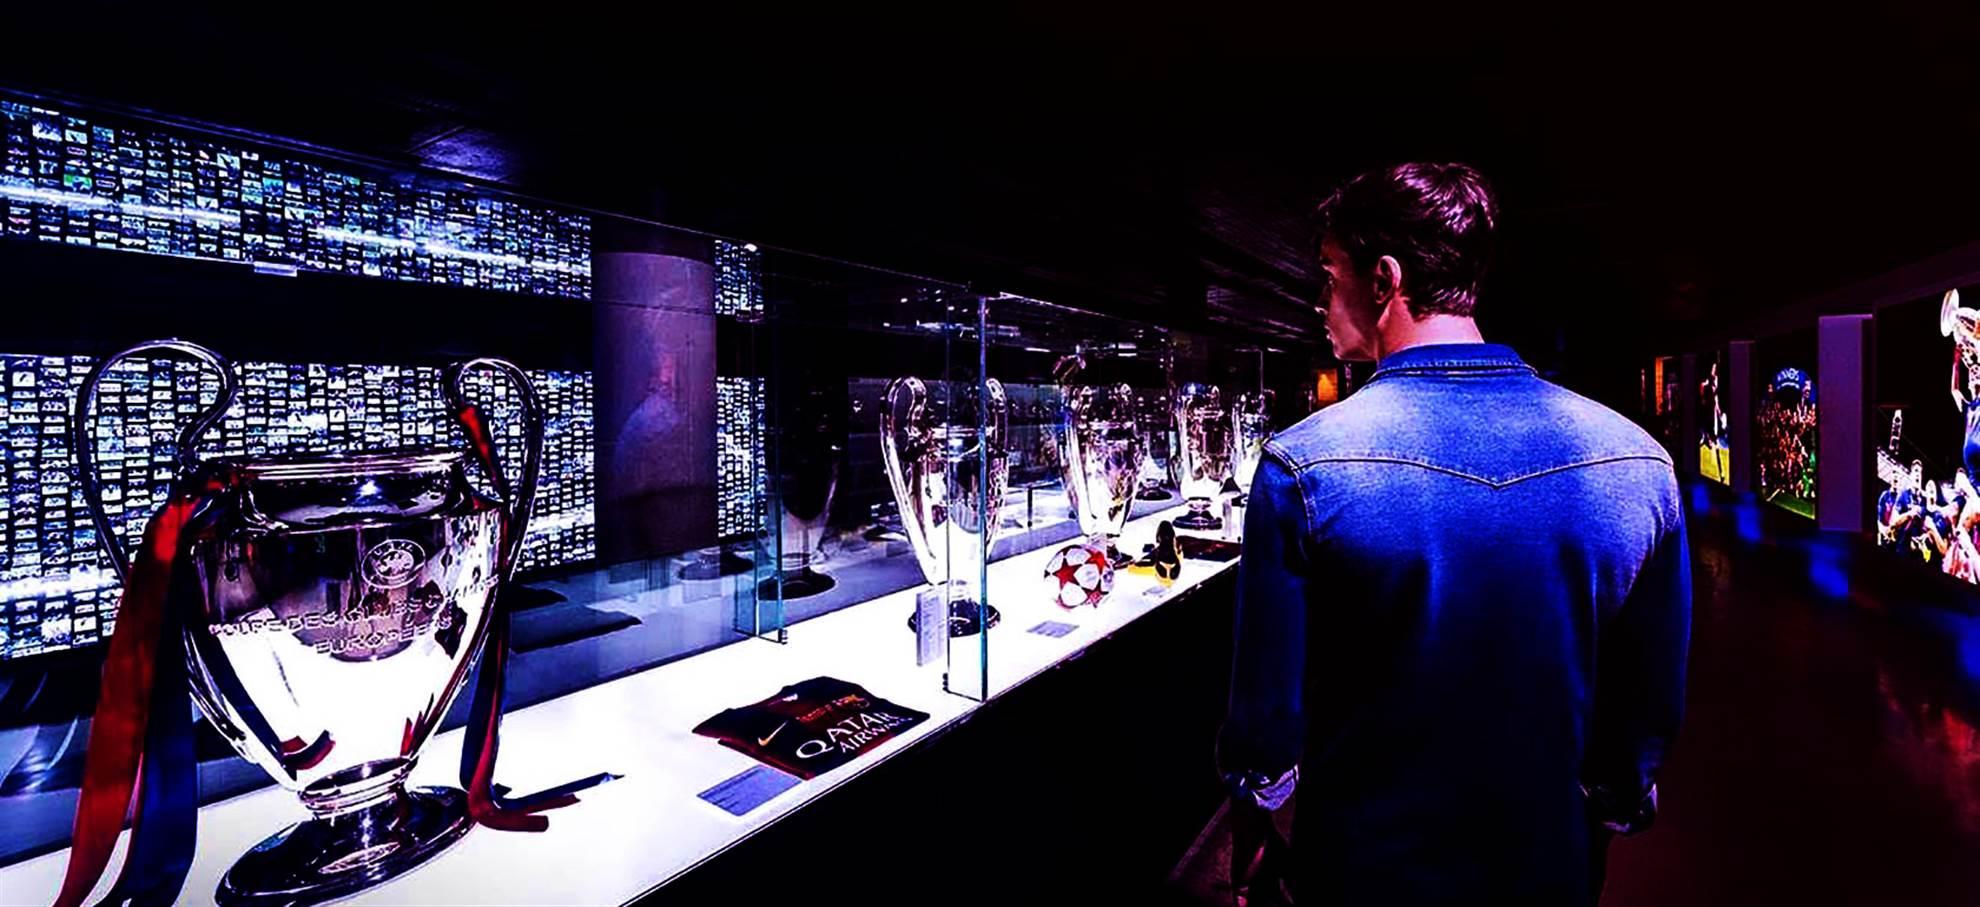 Billet ouvert visite du Camp Nou, FC Barcelone